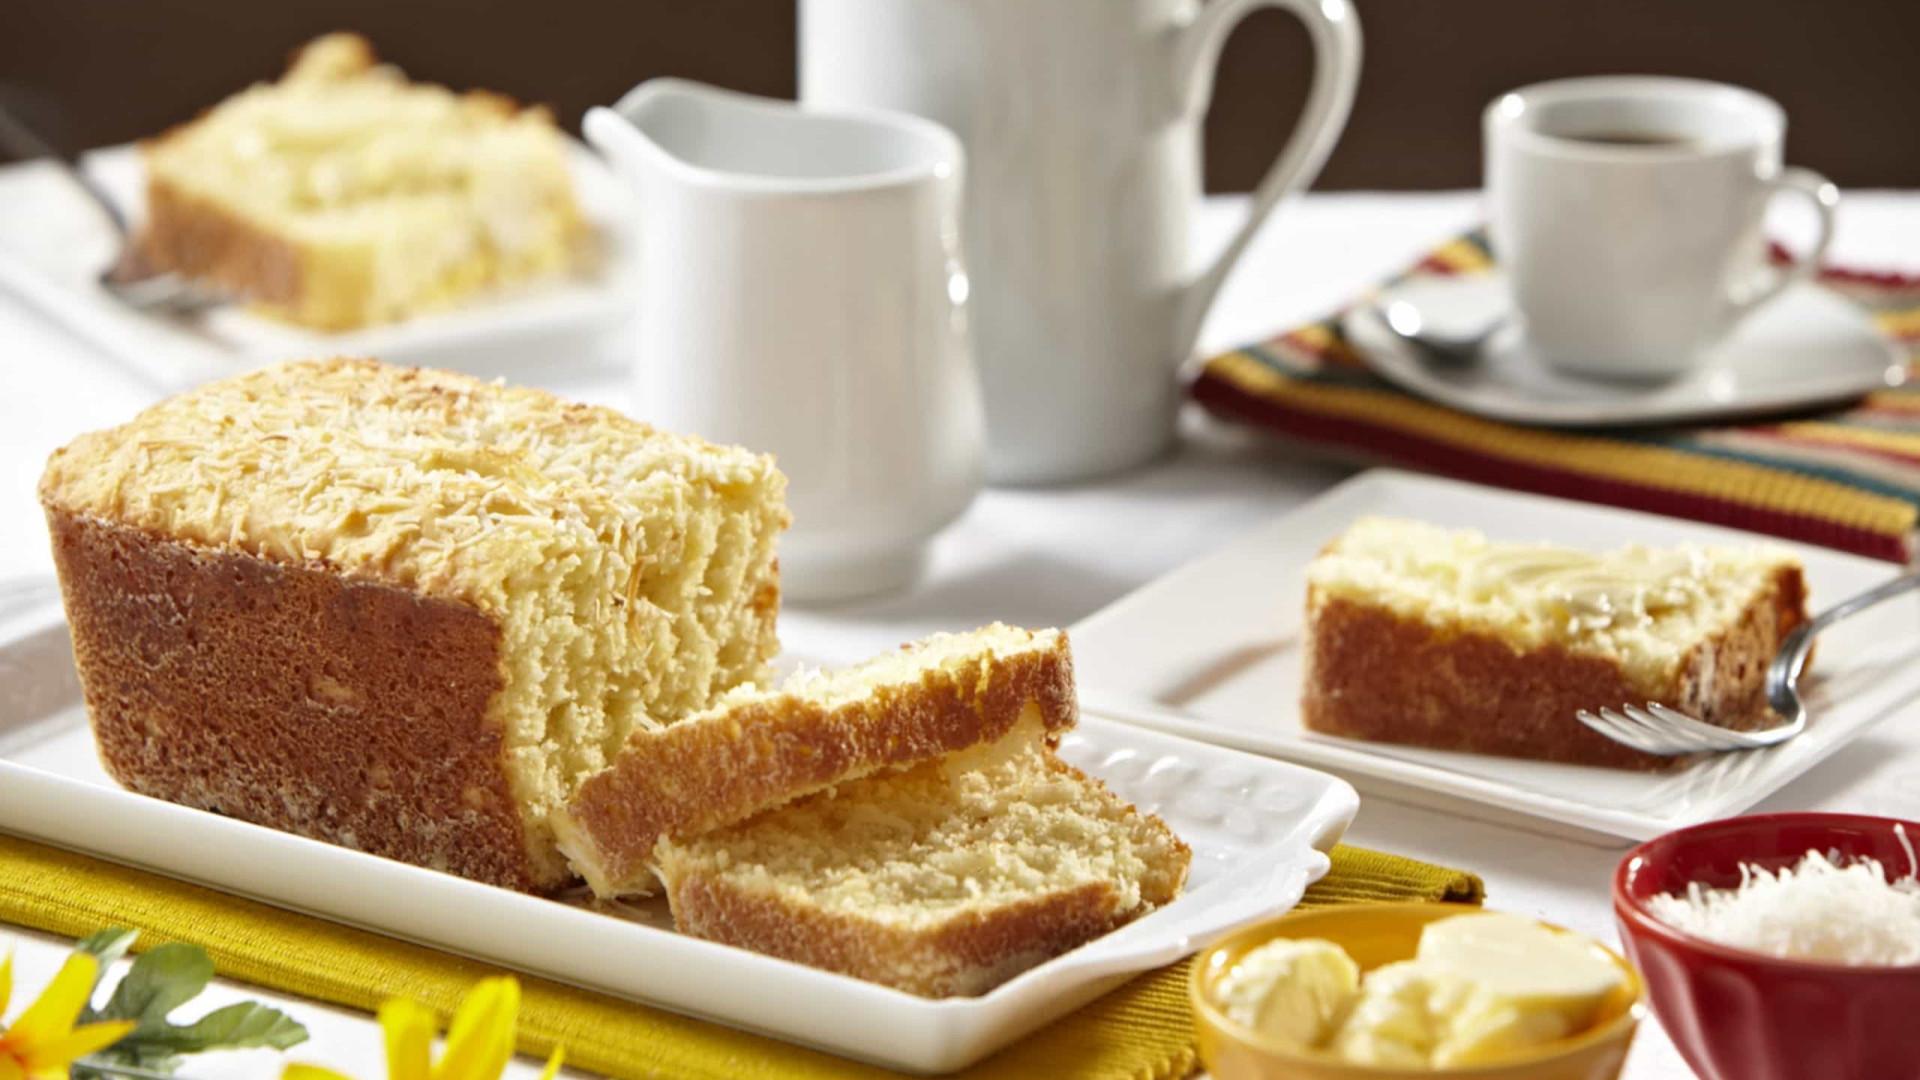 Aprenda a preparar um delicioso Pão de Coco de liquidificador